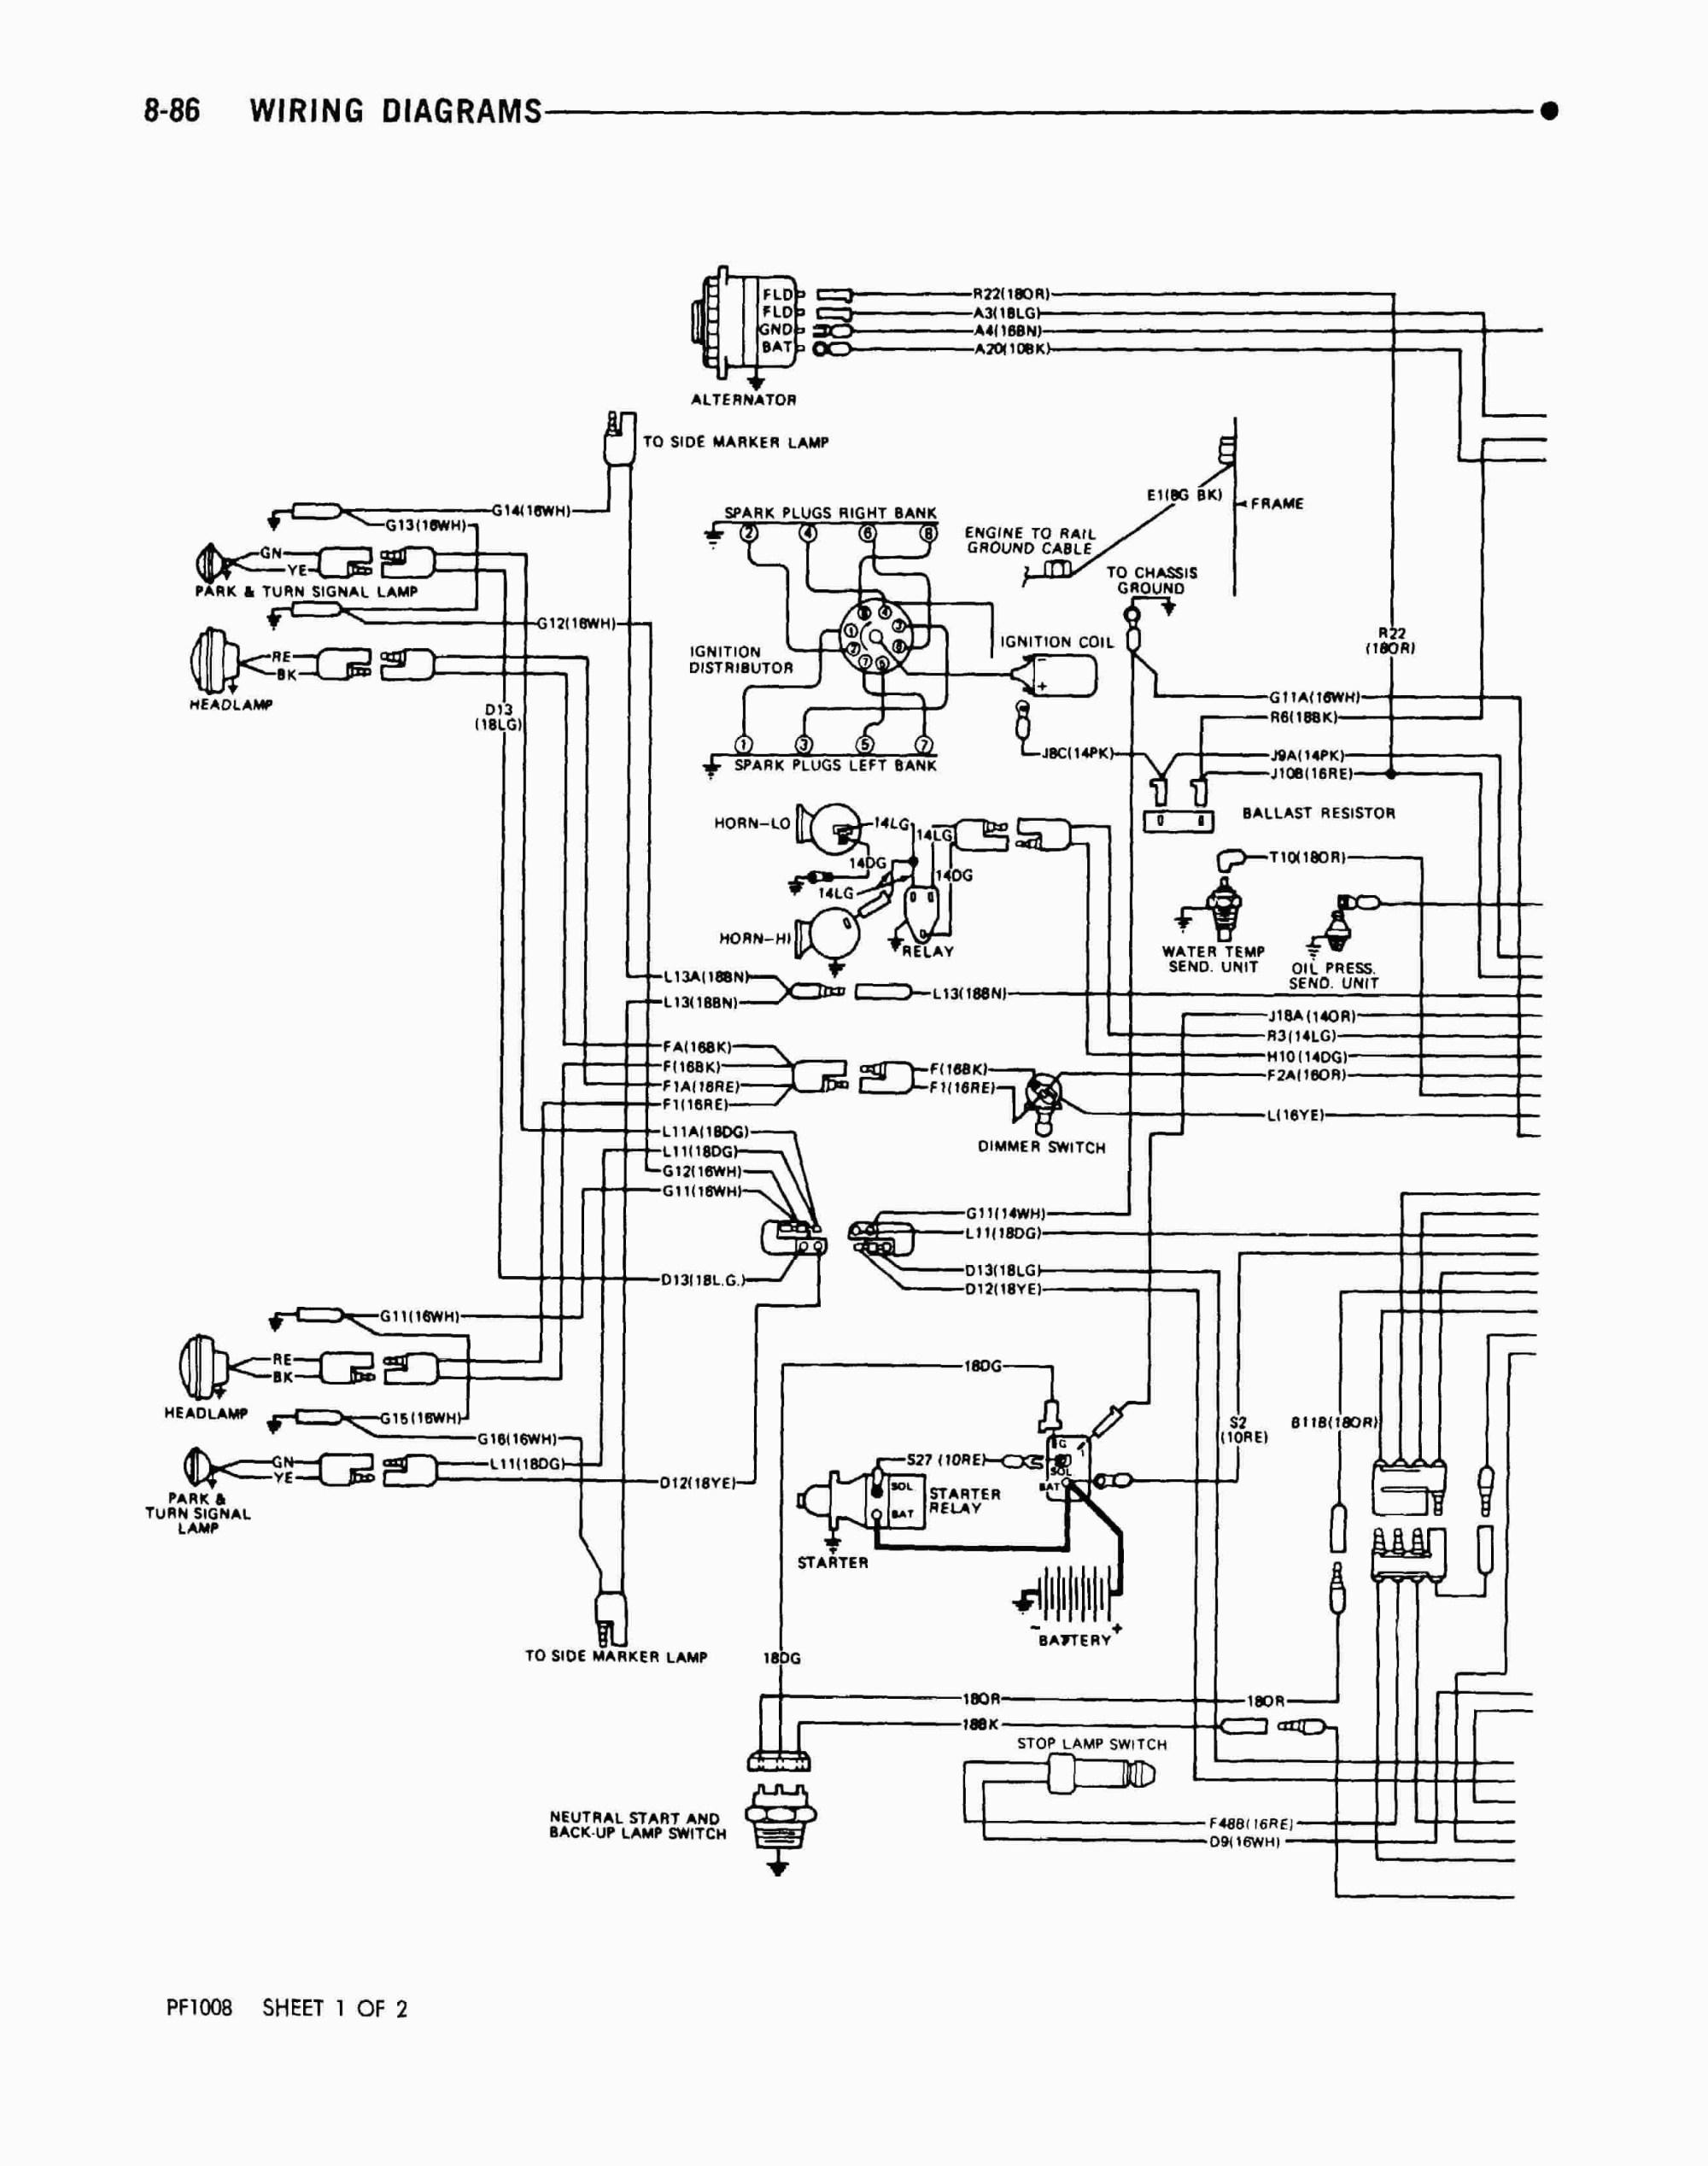 hight resolution of 86 winnebago fuel tank selector valve wiring diagram schematic 1984 winnebago wiring diagrams wiring diagram manual for 1986 winnebago